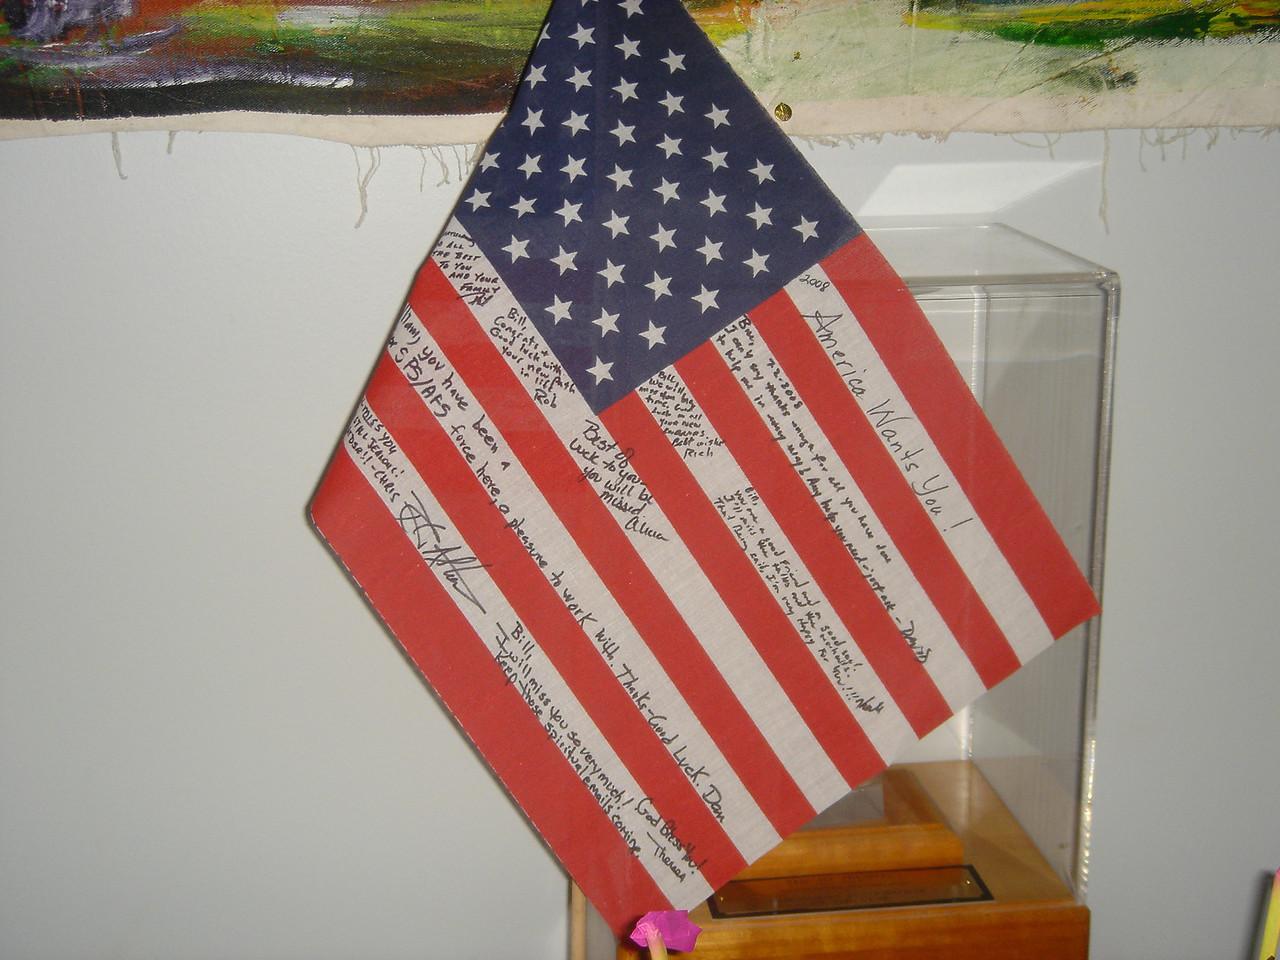 Keep working toward citizenship - America does need people like you!